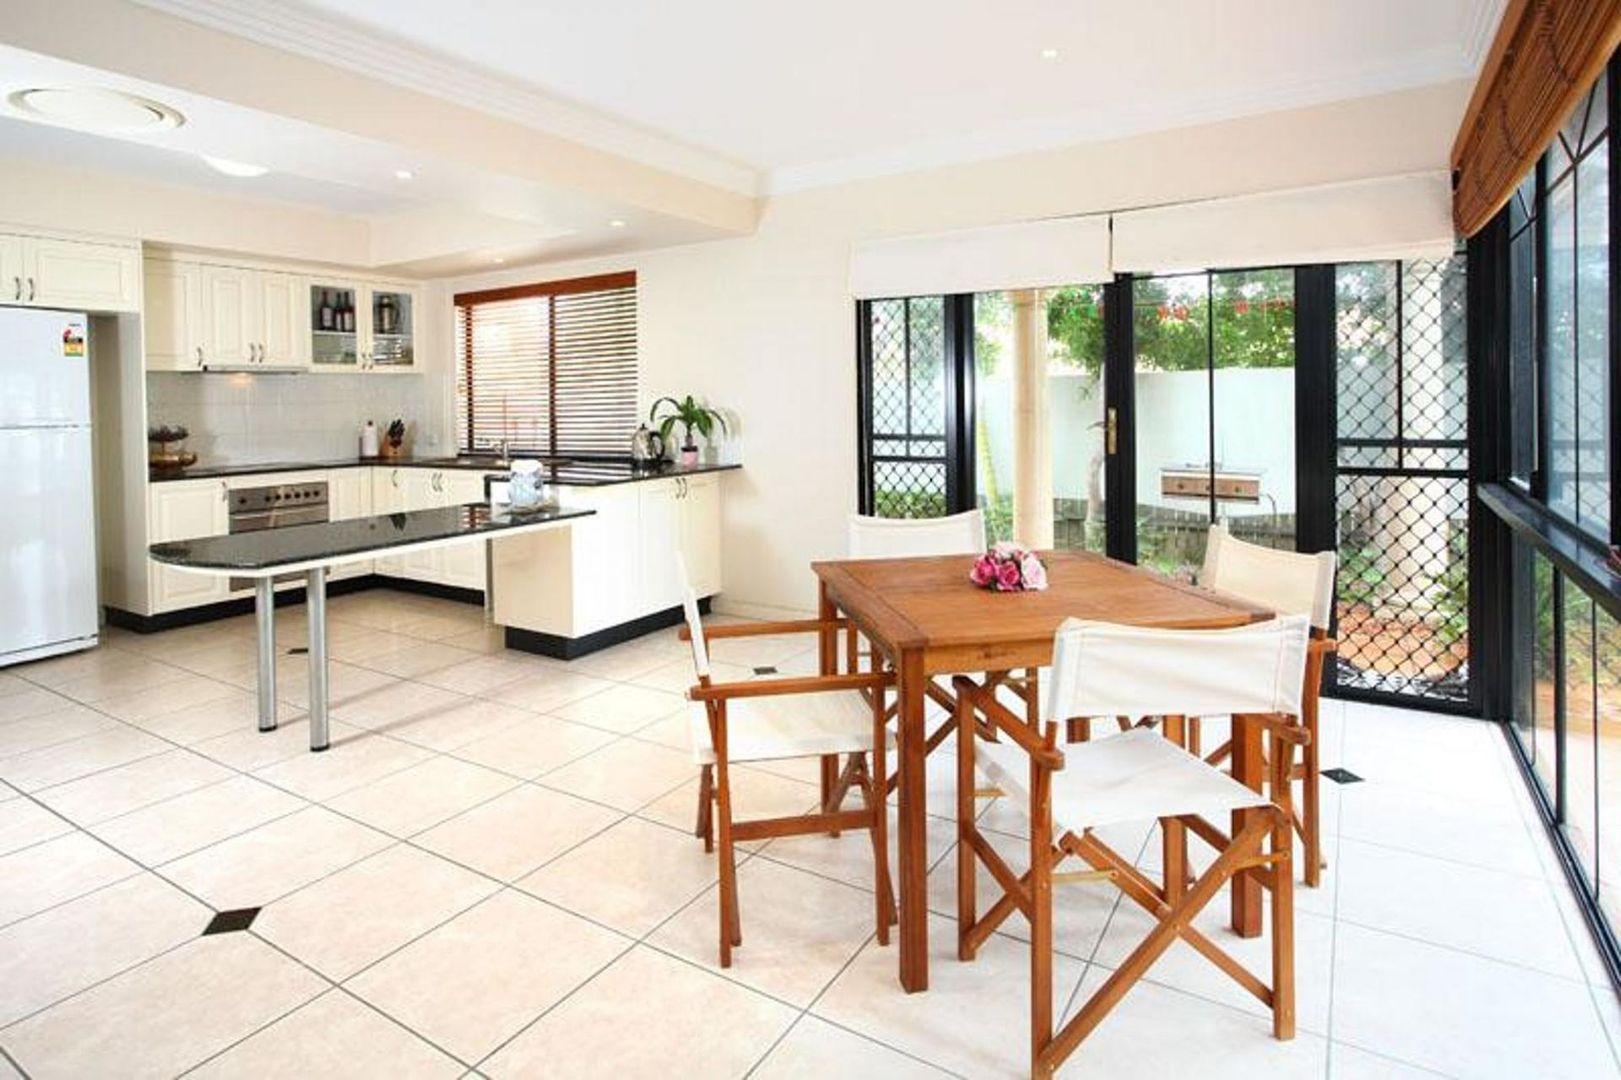 18/24 Radan St, Sunnybank Hills QLD 4109, Image 2